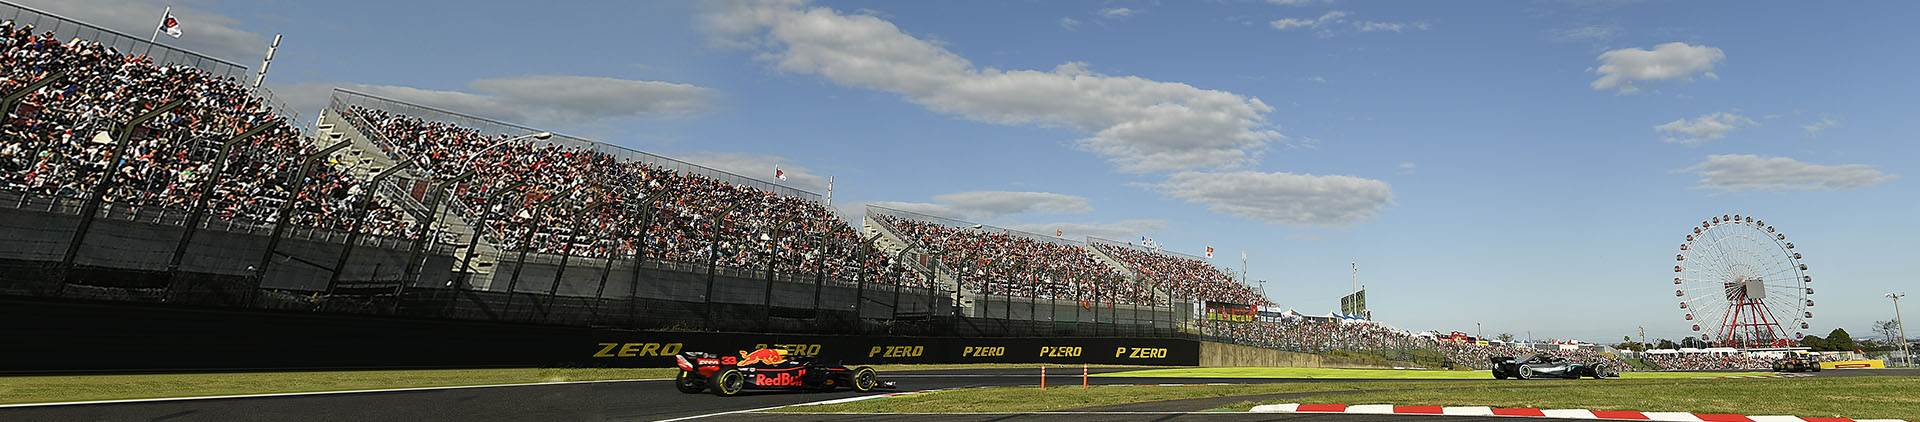 F1 Japan